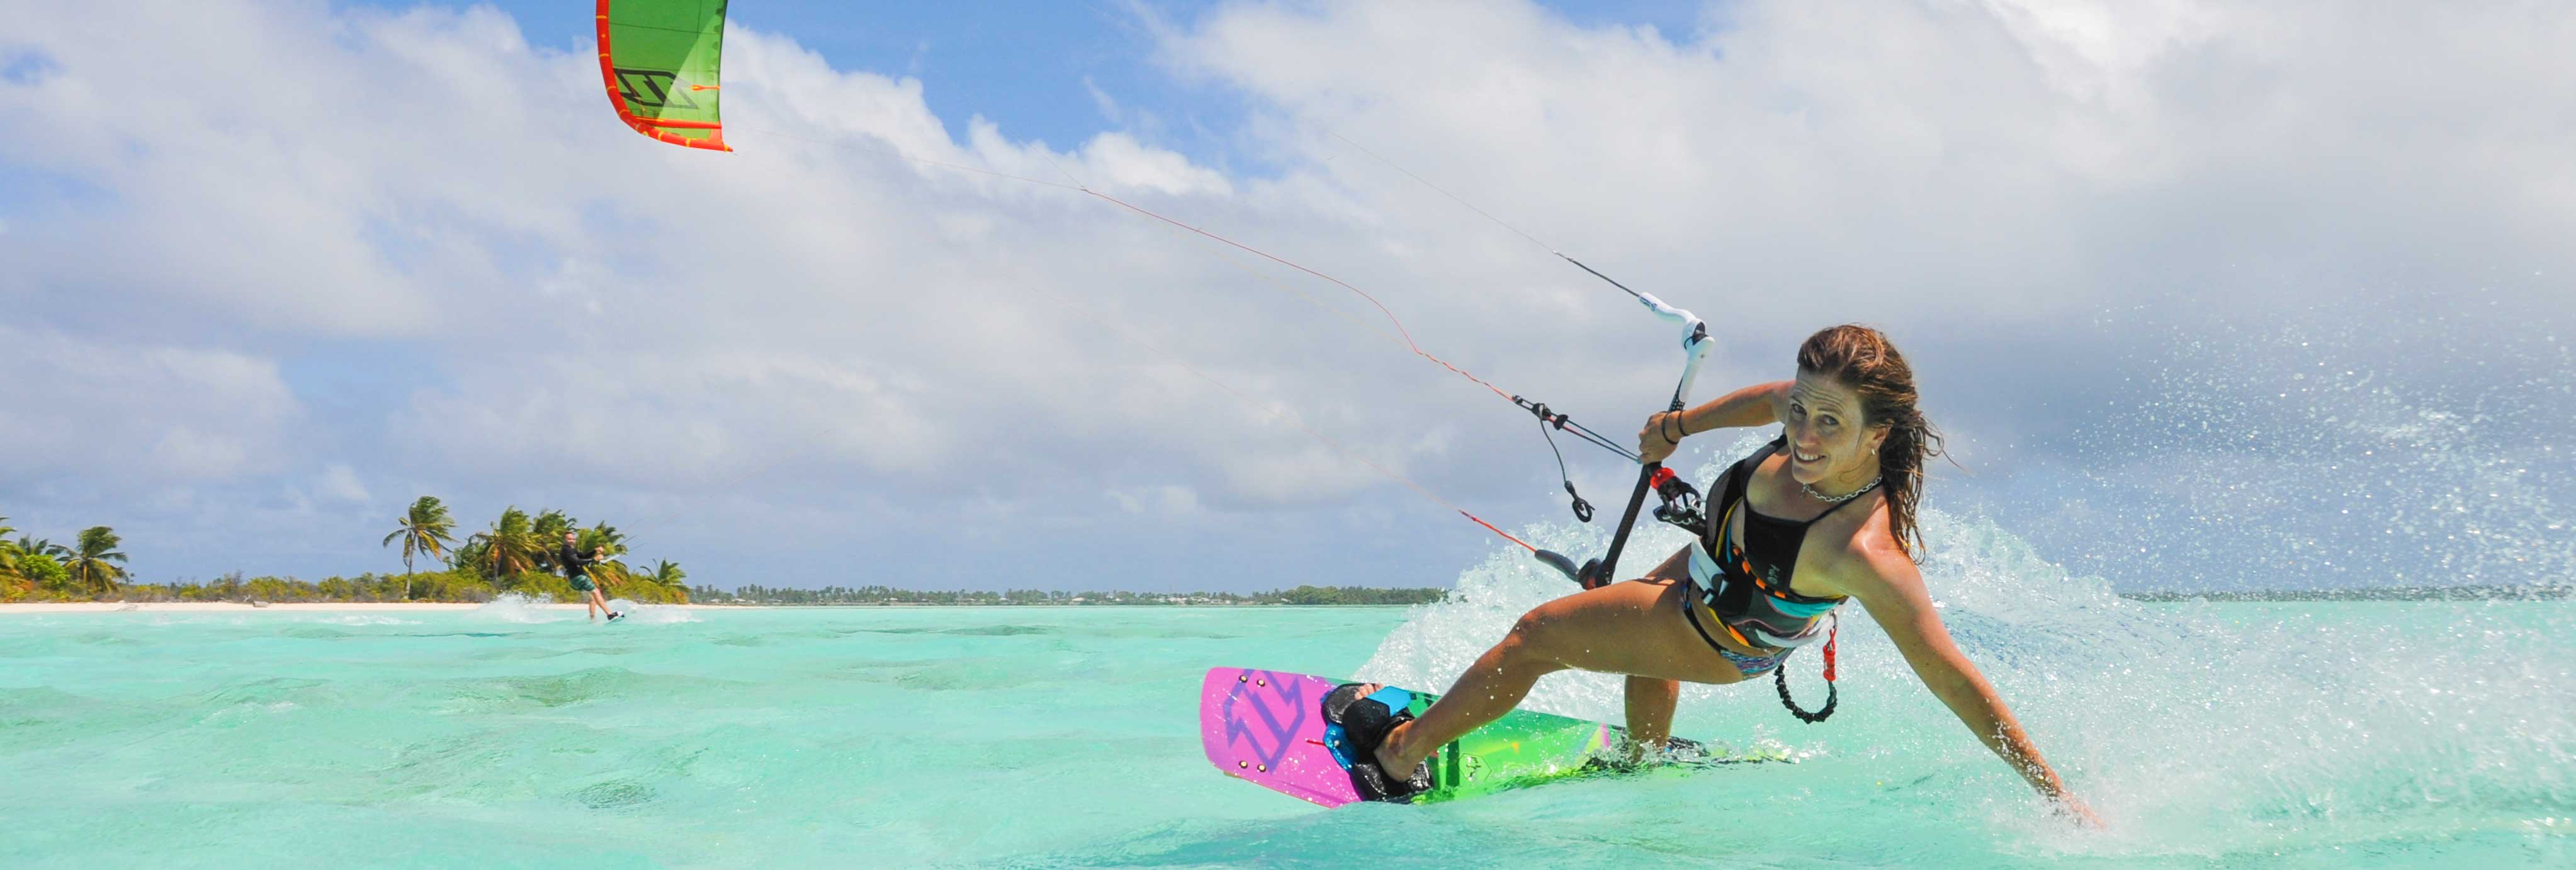 Cocos Keeling Islands kitesurfing girl